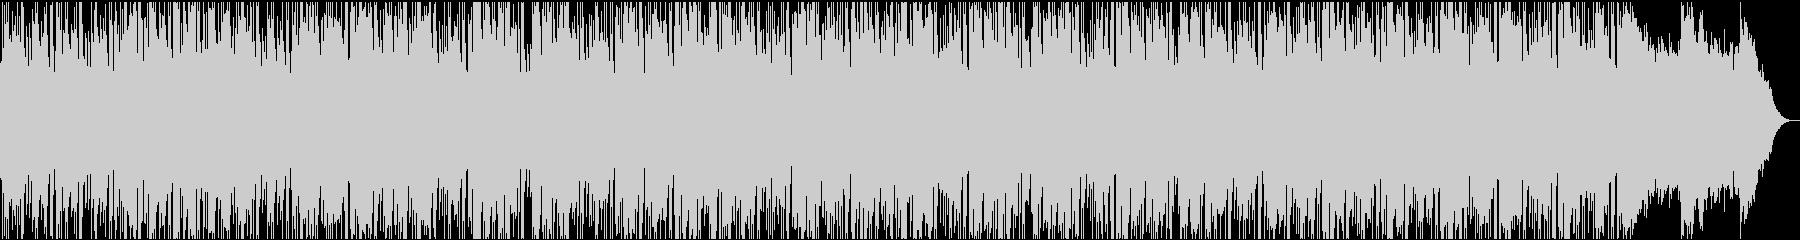 UKロック風インストの未再生の波形